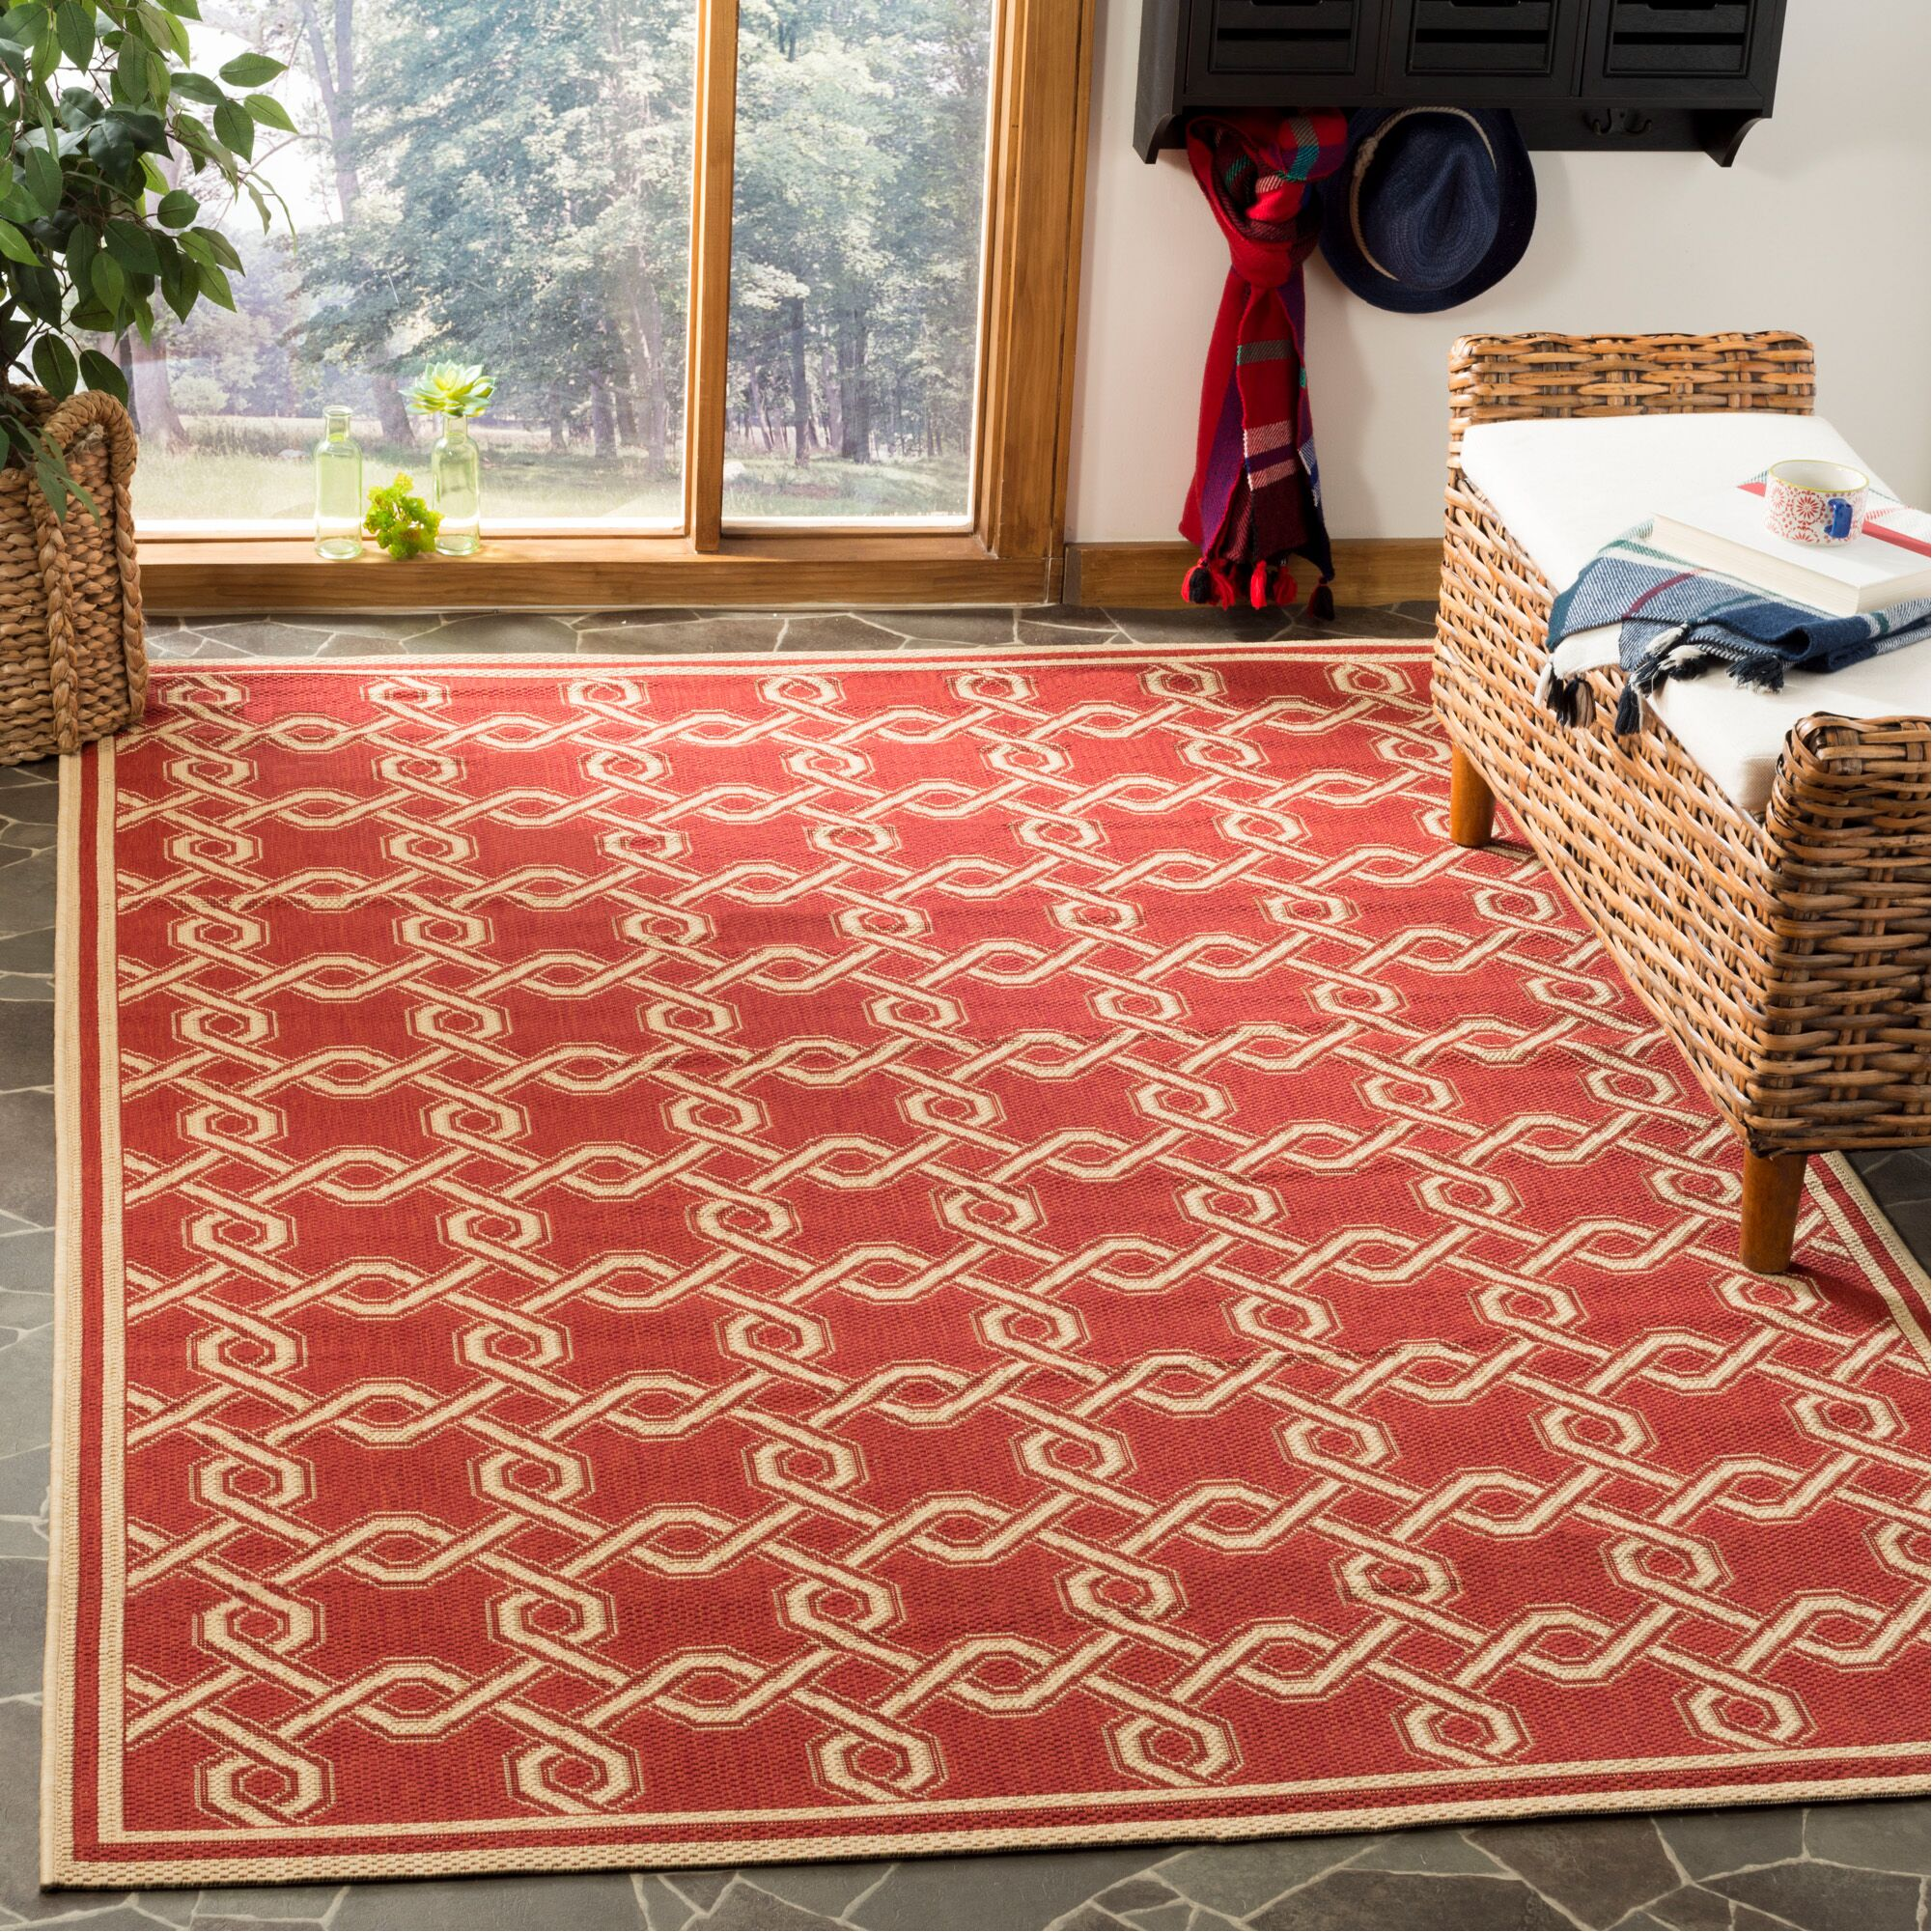 Martha Stewart Red/Creme Area Rug Rug Size: Rectangle 5'3